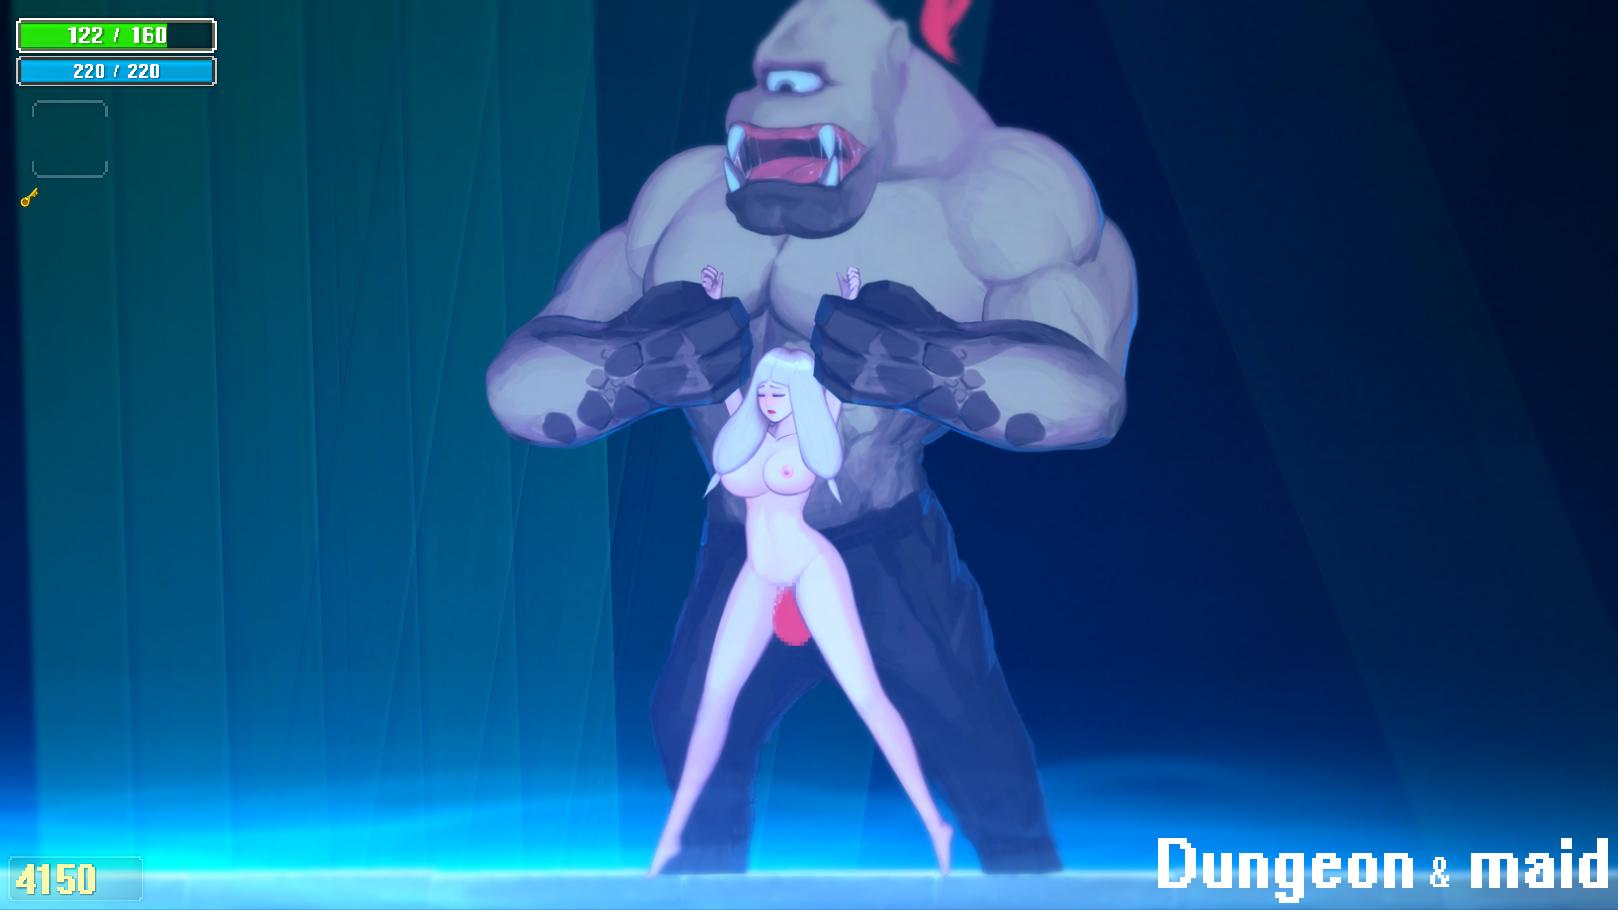 Anime Maid Porn Game English dungeon & maid » pornova - hentai games & 3d hentai video